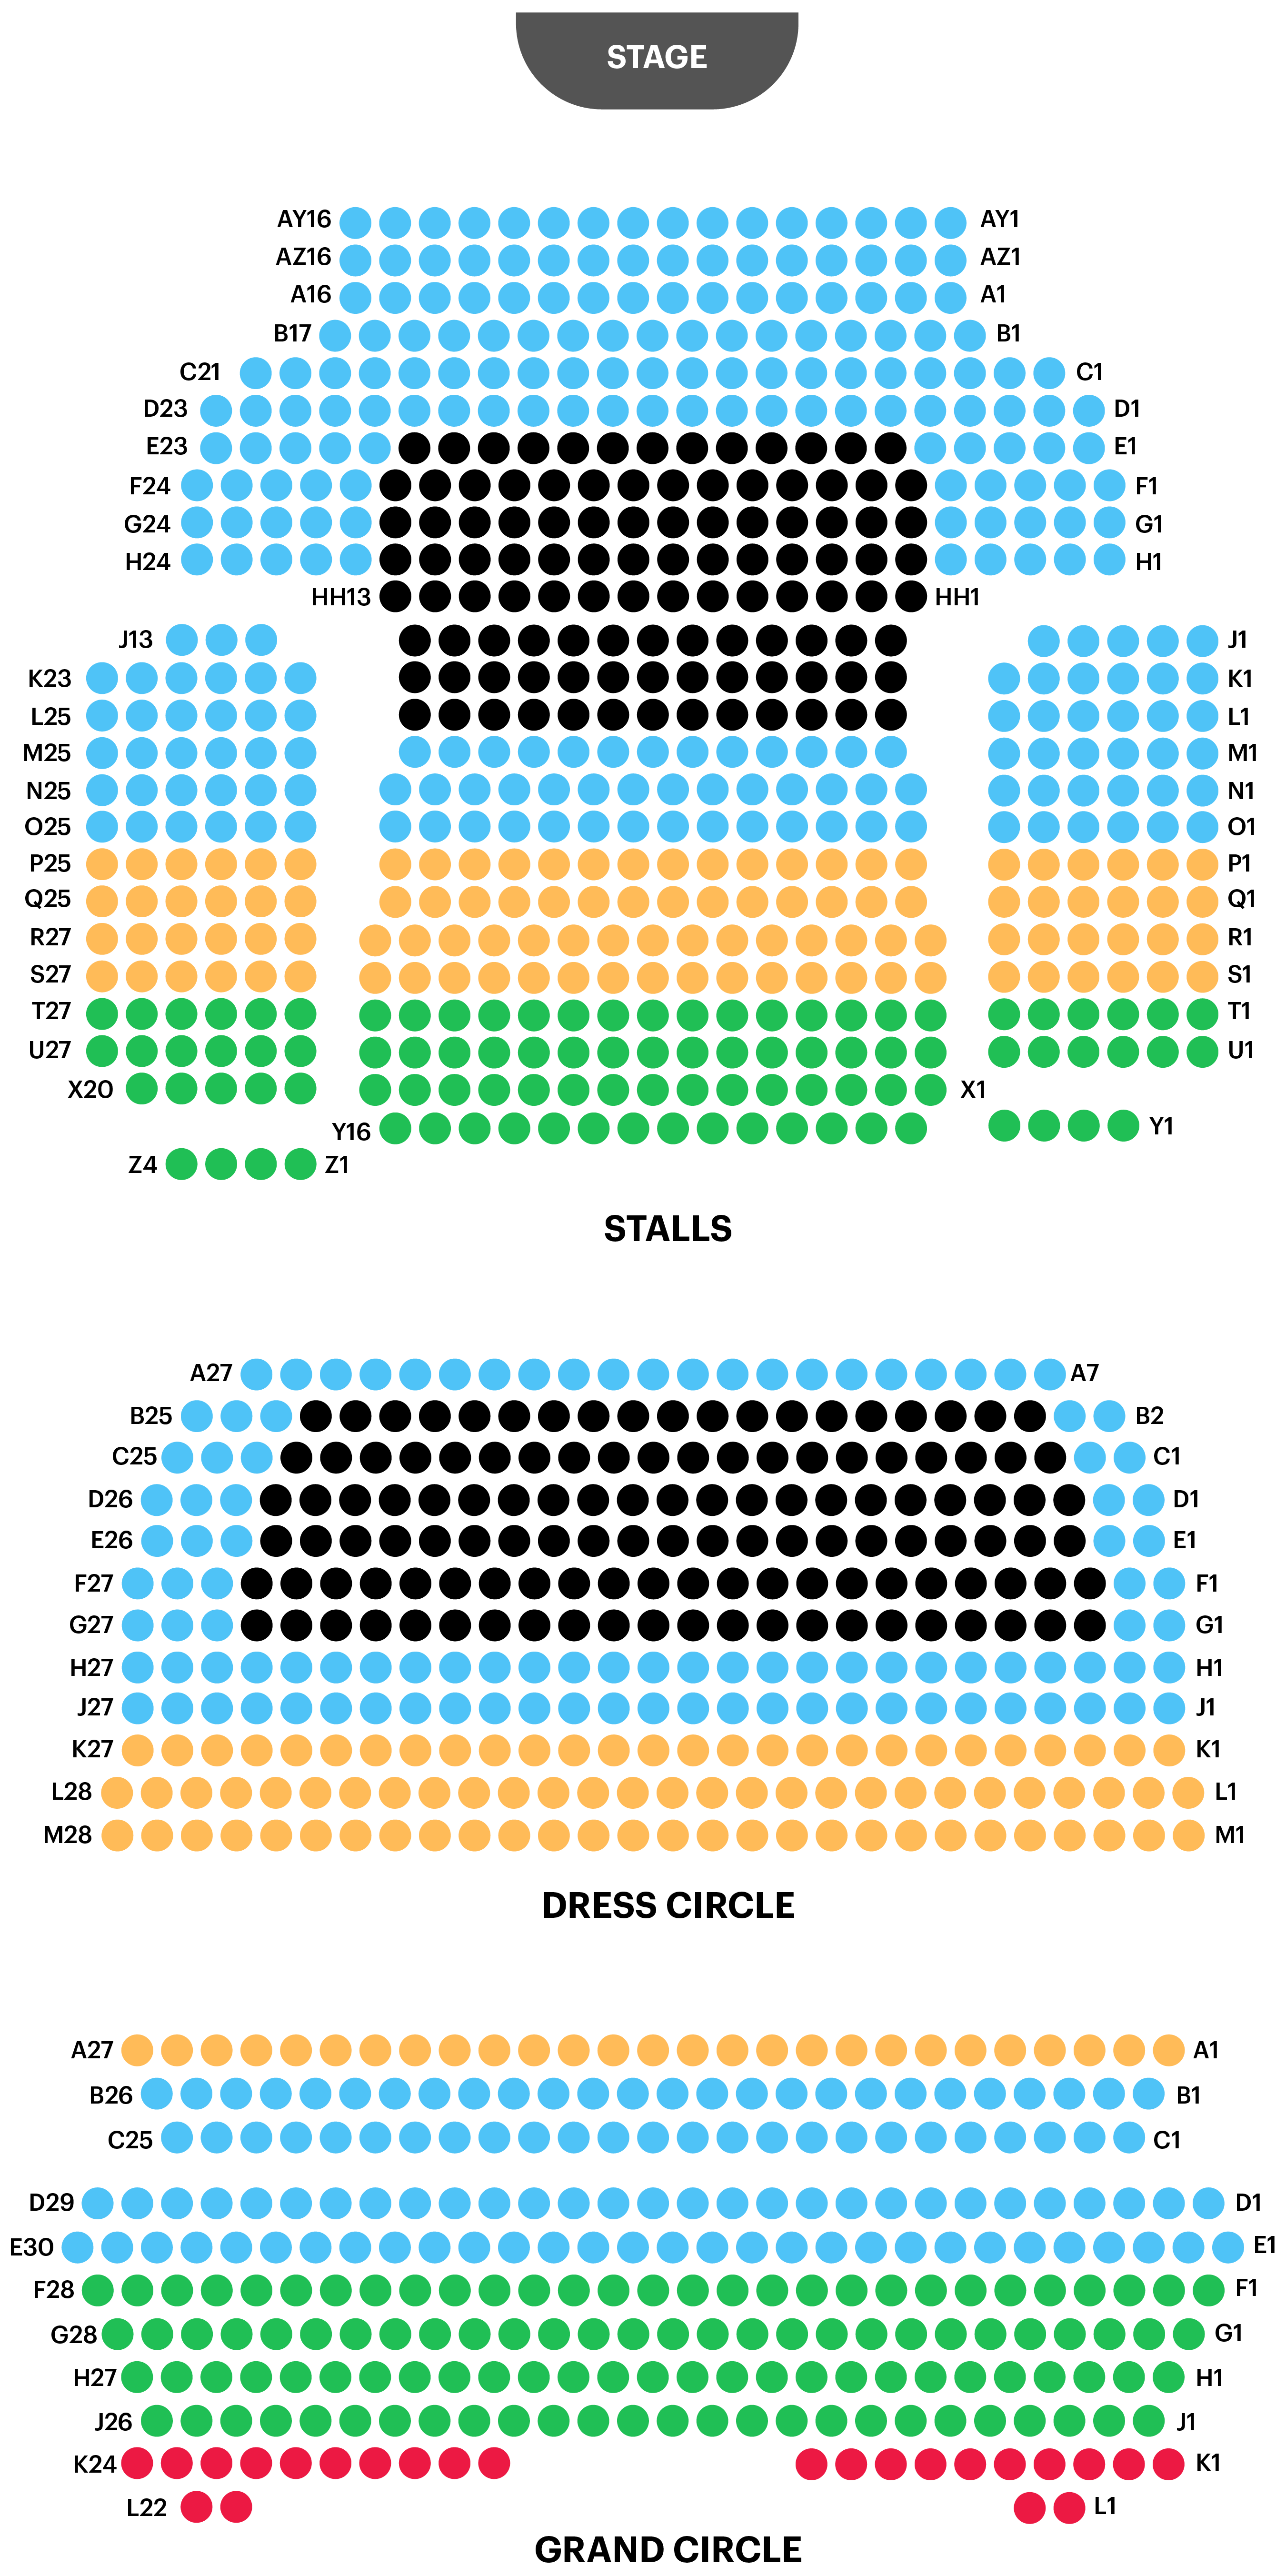 Aldywch Theatre Seating Plan